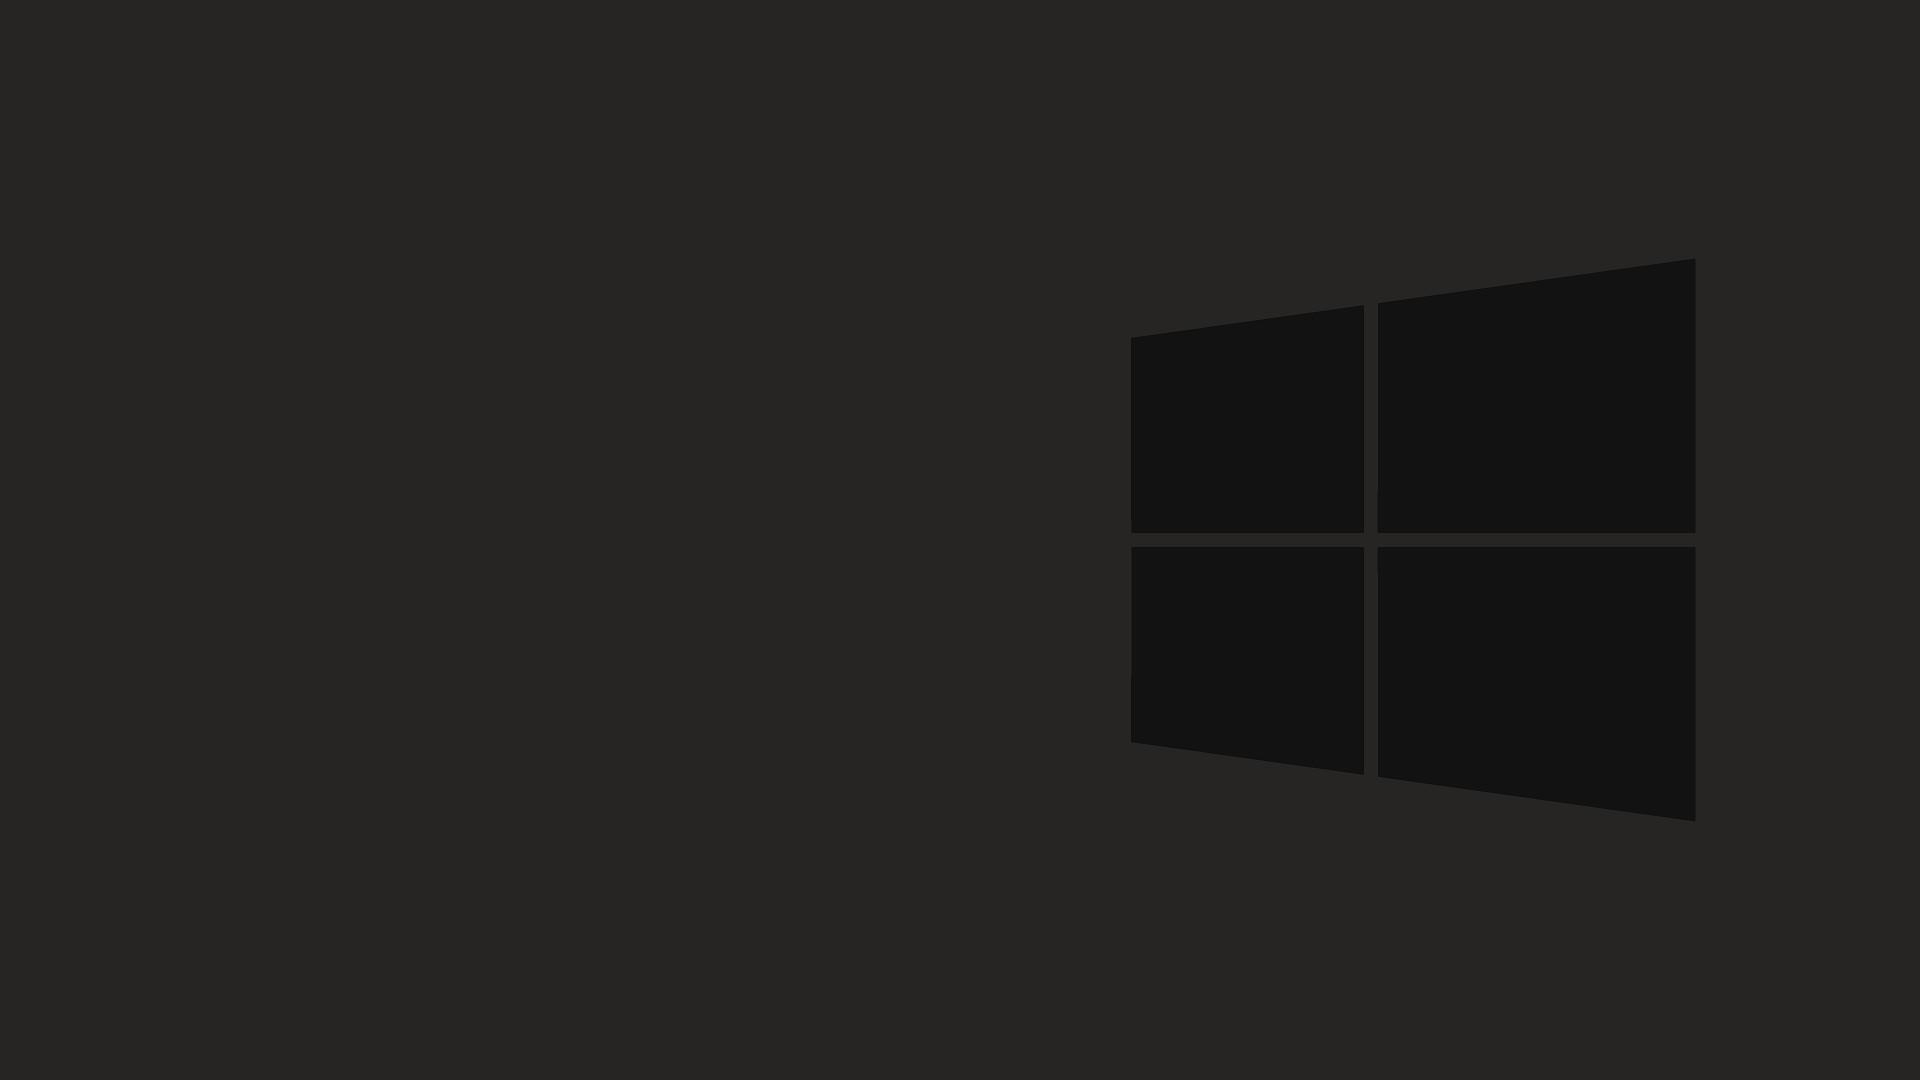 4k Windows 10 Wallpaper 61 Images